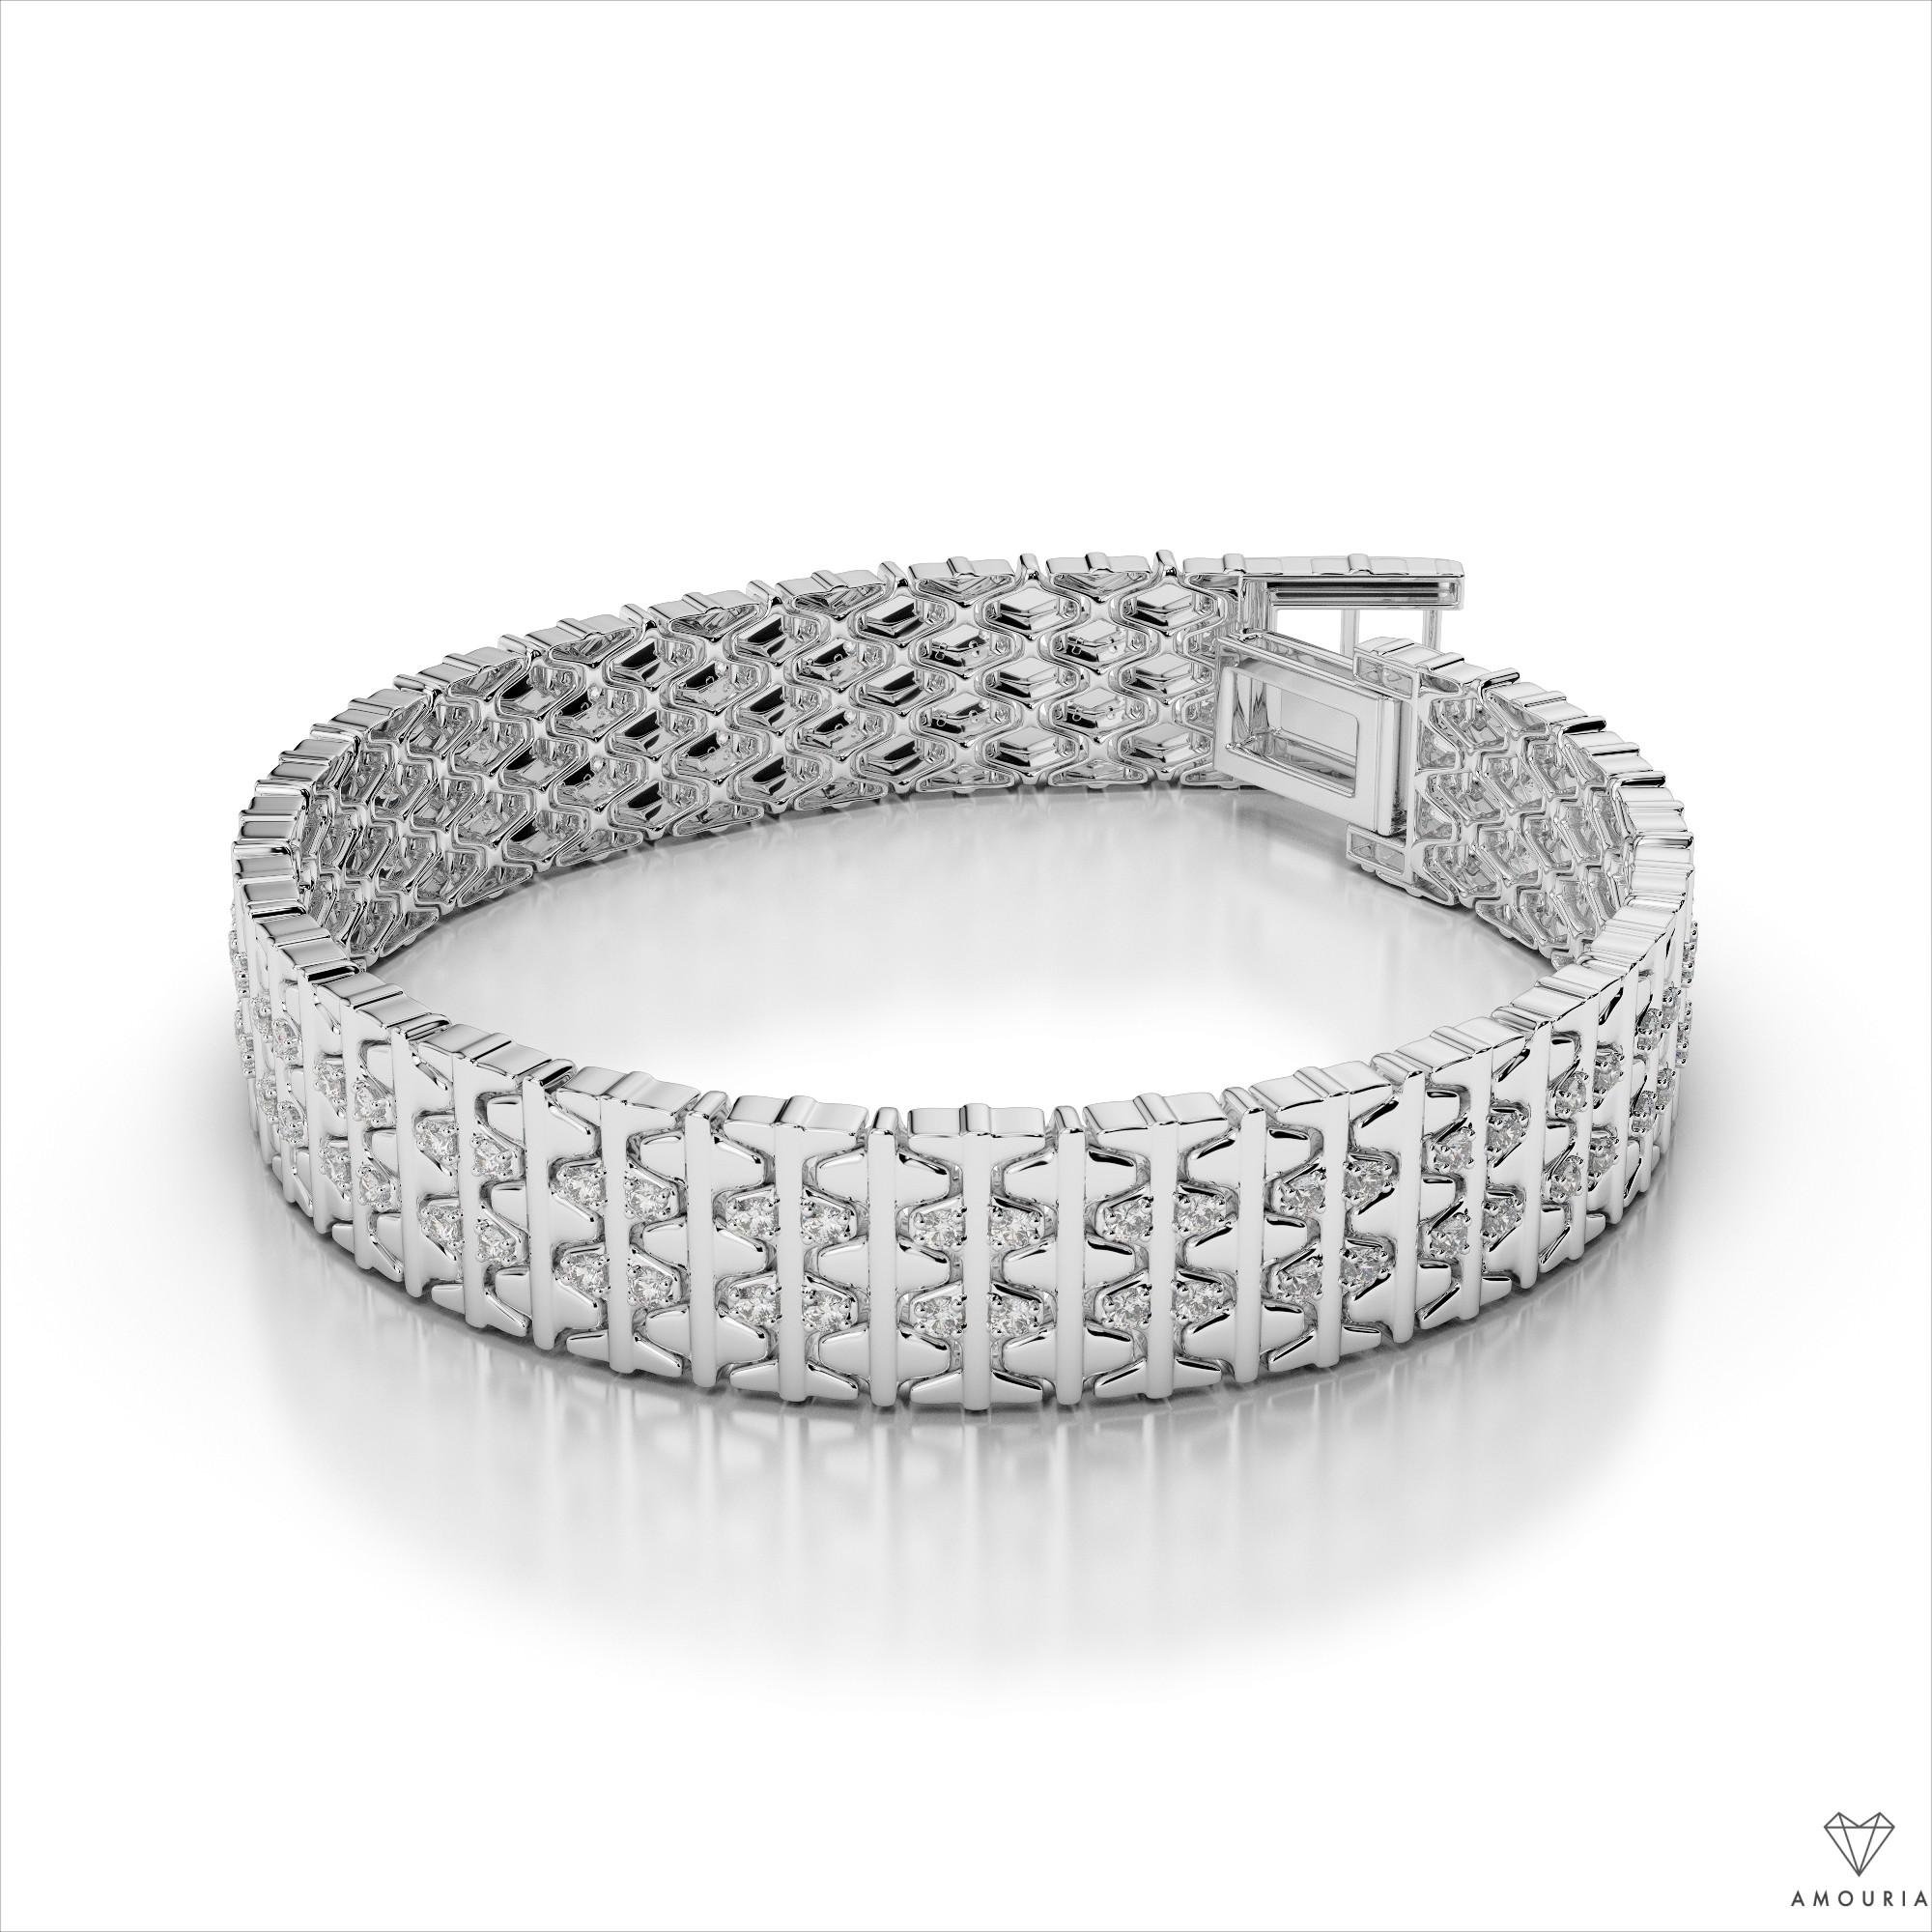 d07e0b0a74d009 Men's Two-Tone Diamond Bracelet. $3,492.00. $3,143.00. Customize Bracelet.  14k White Gold ...